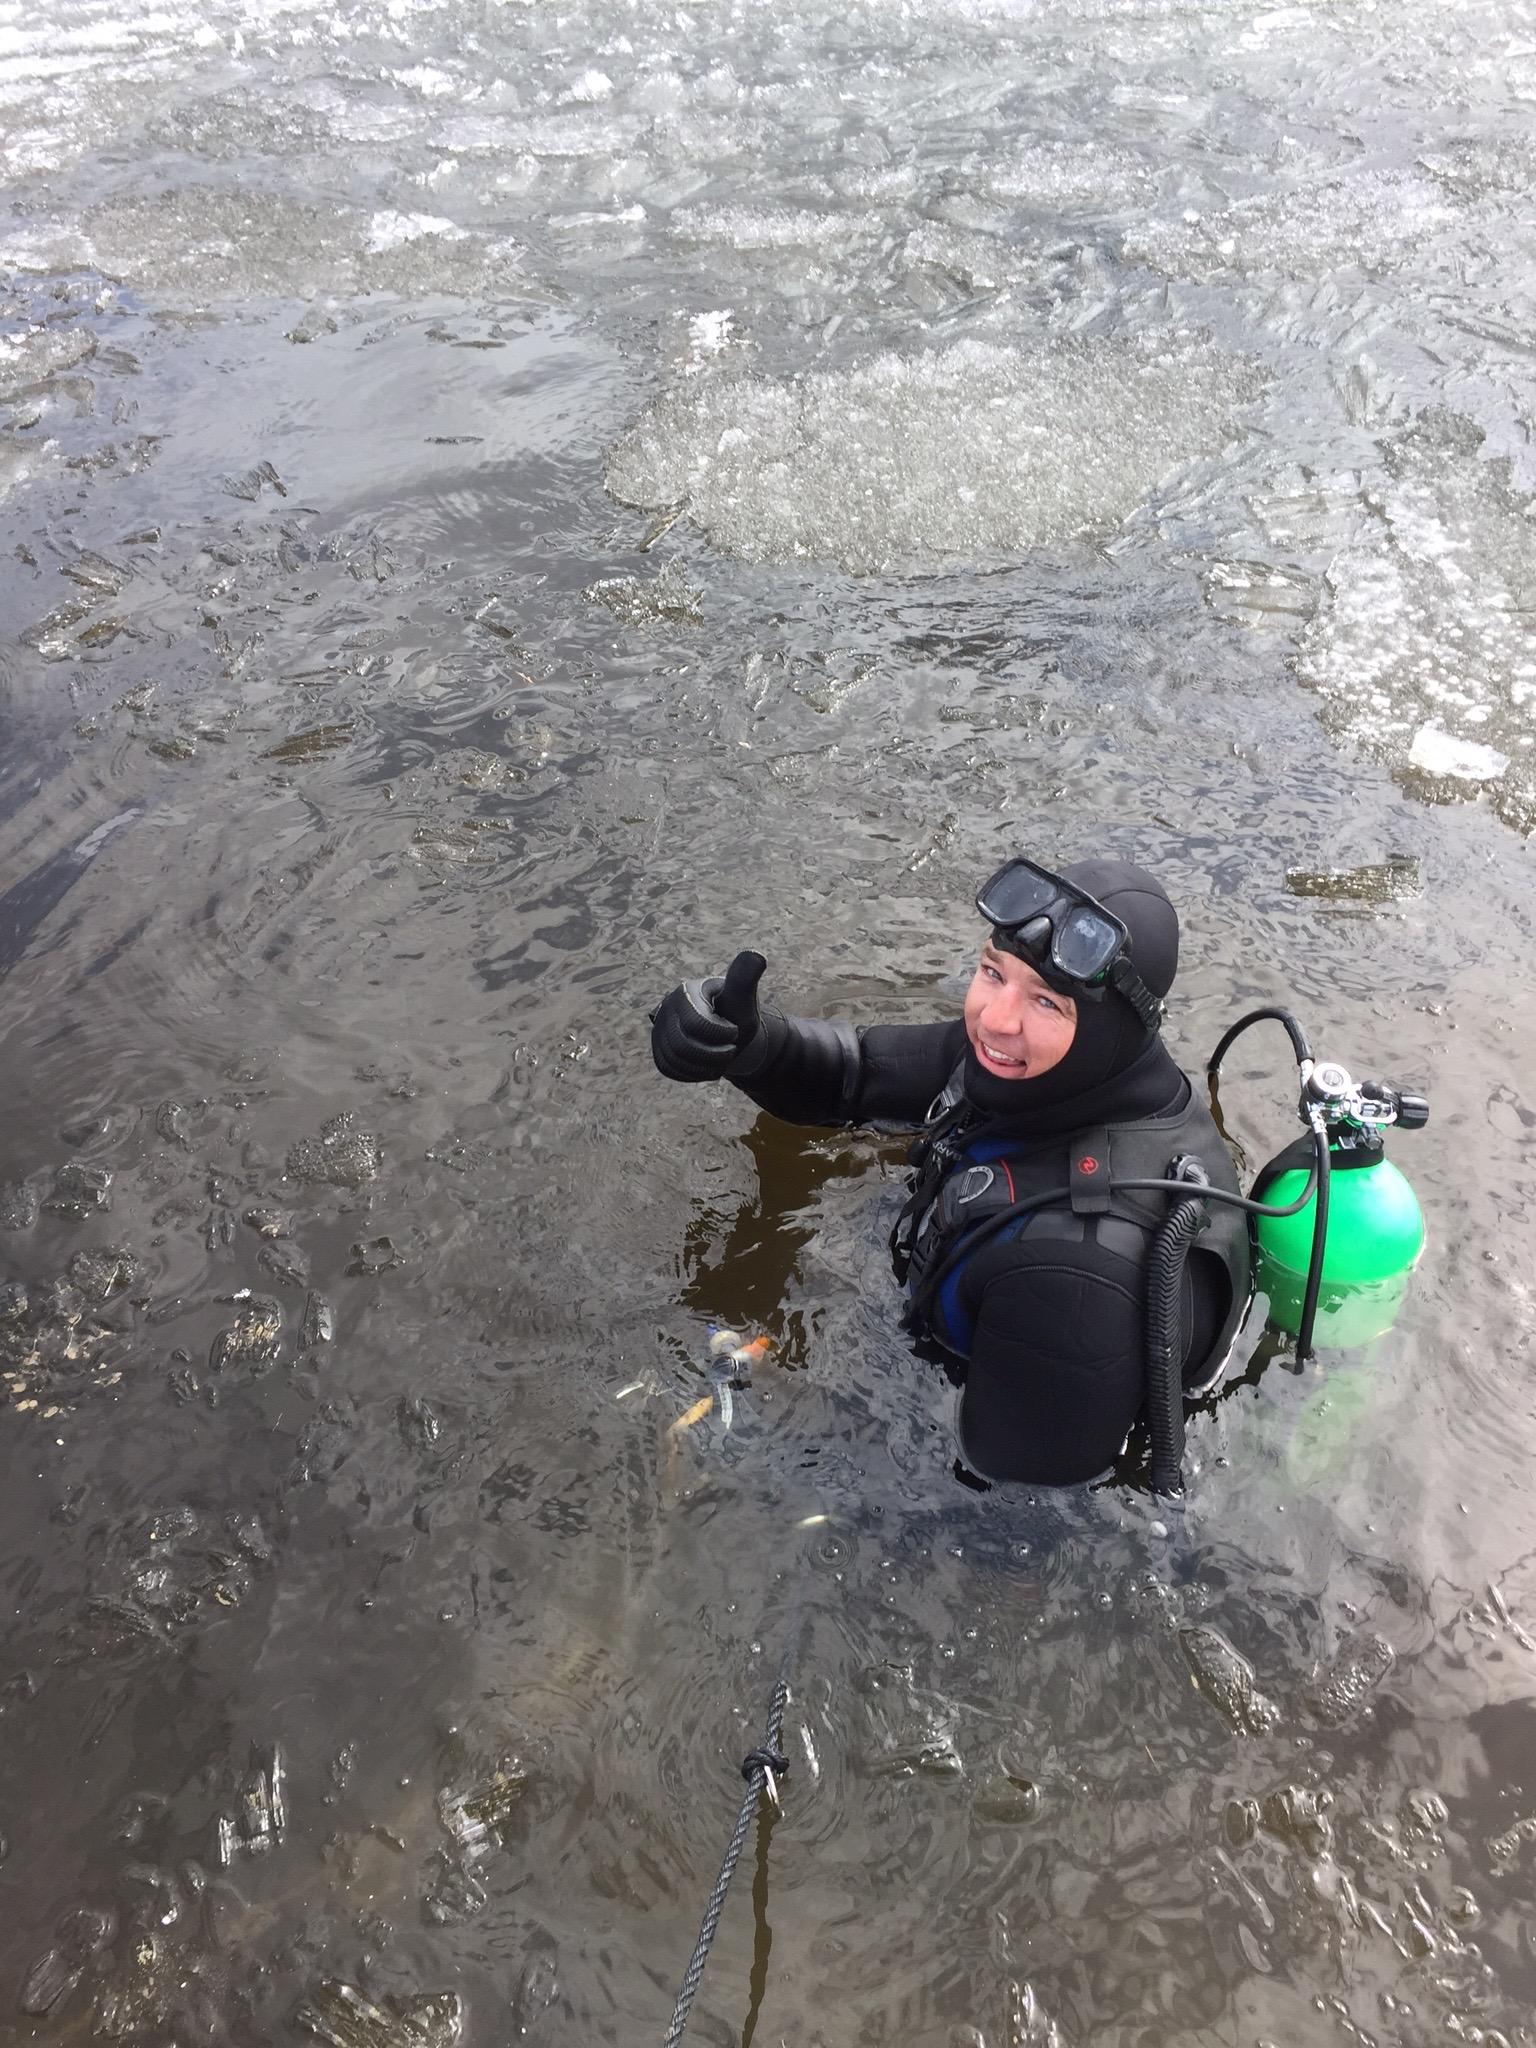 worker in wetsuit